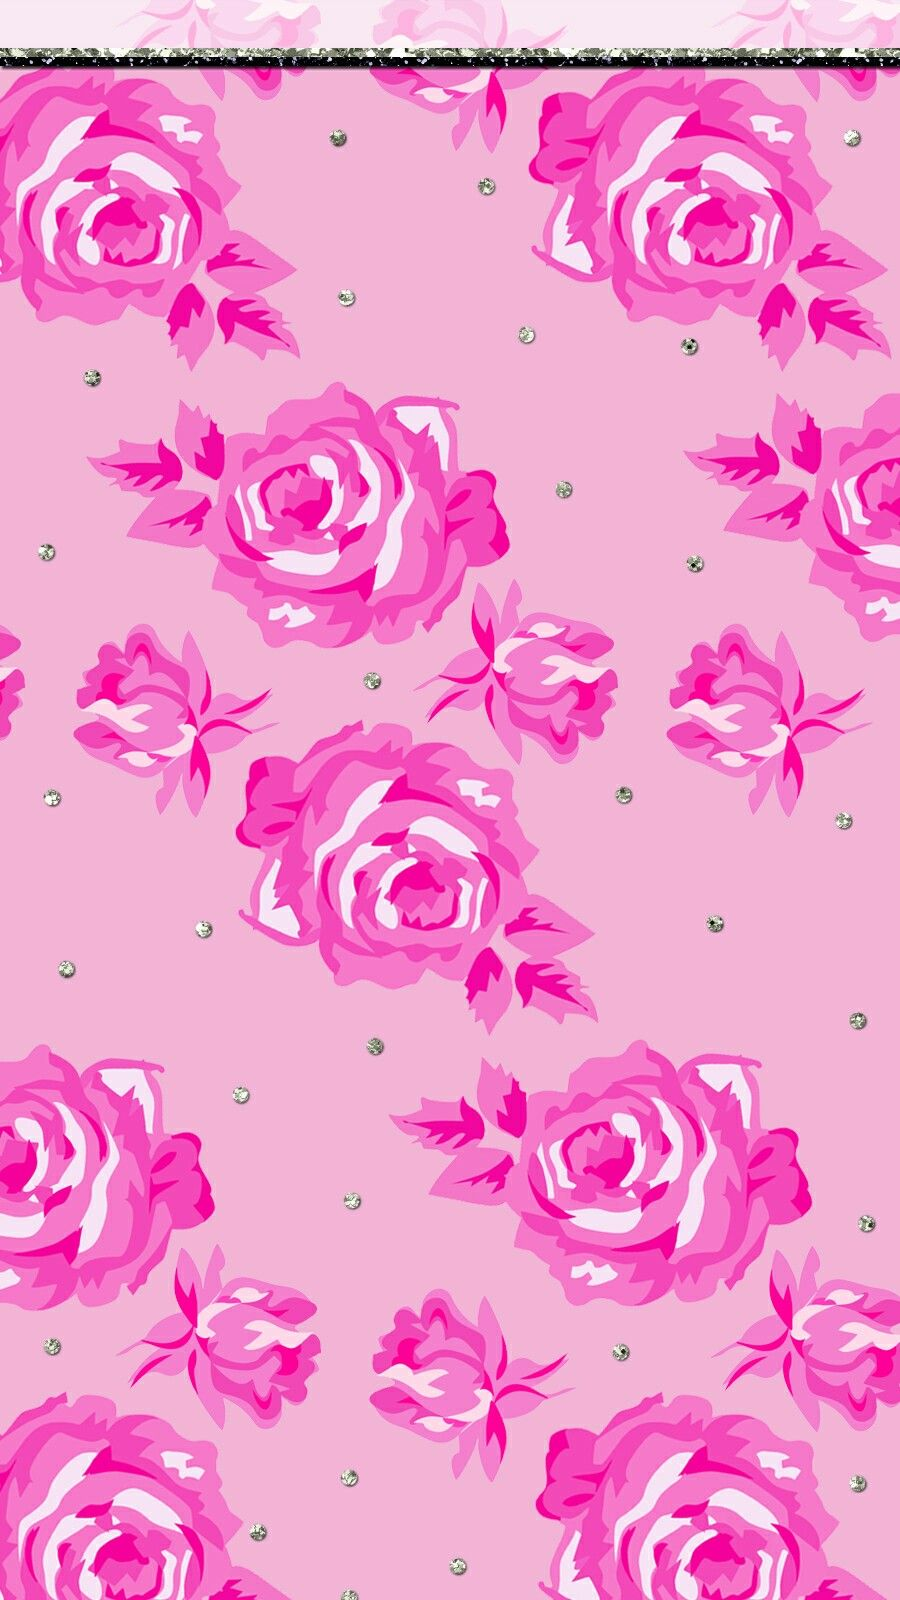 Hot Pink Wallpaper Iphone Cutewalls Pink Wallpaper Iphone